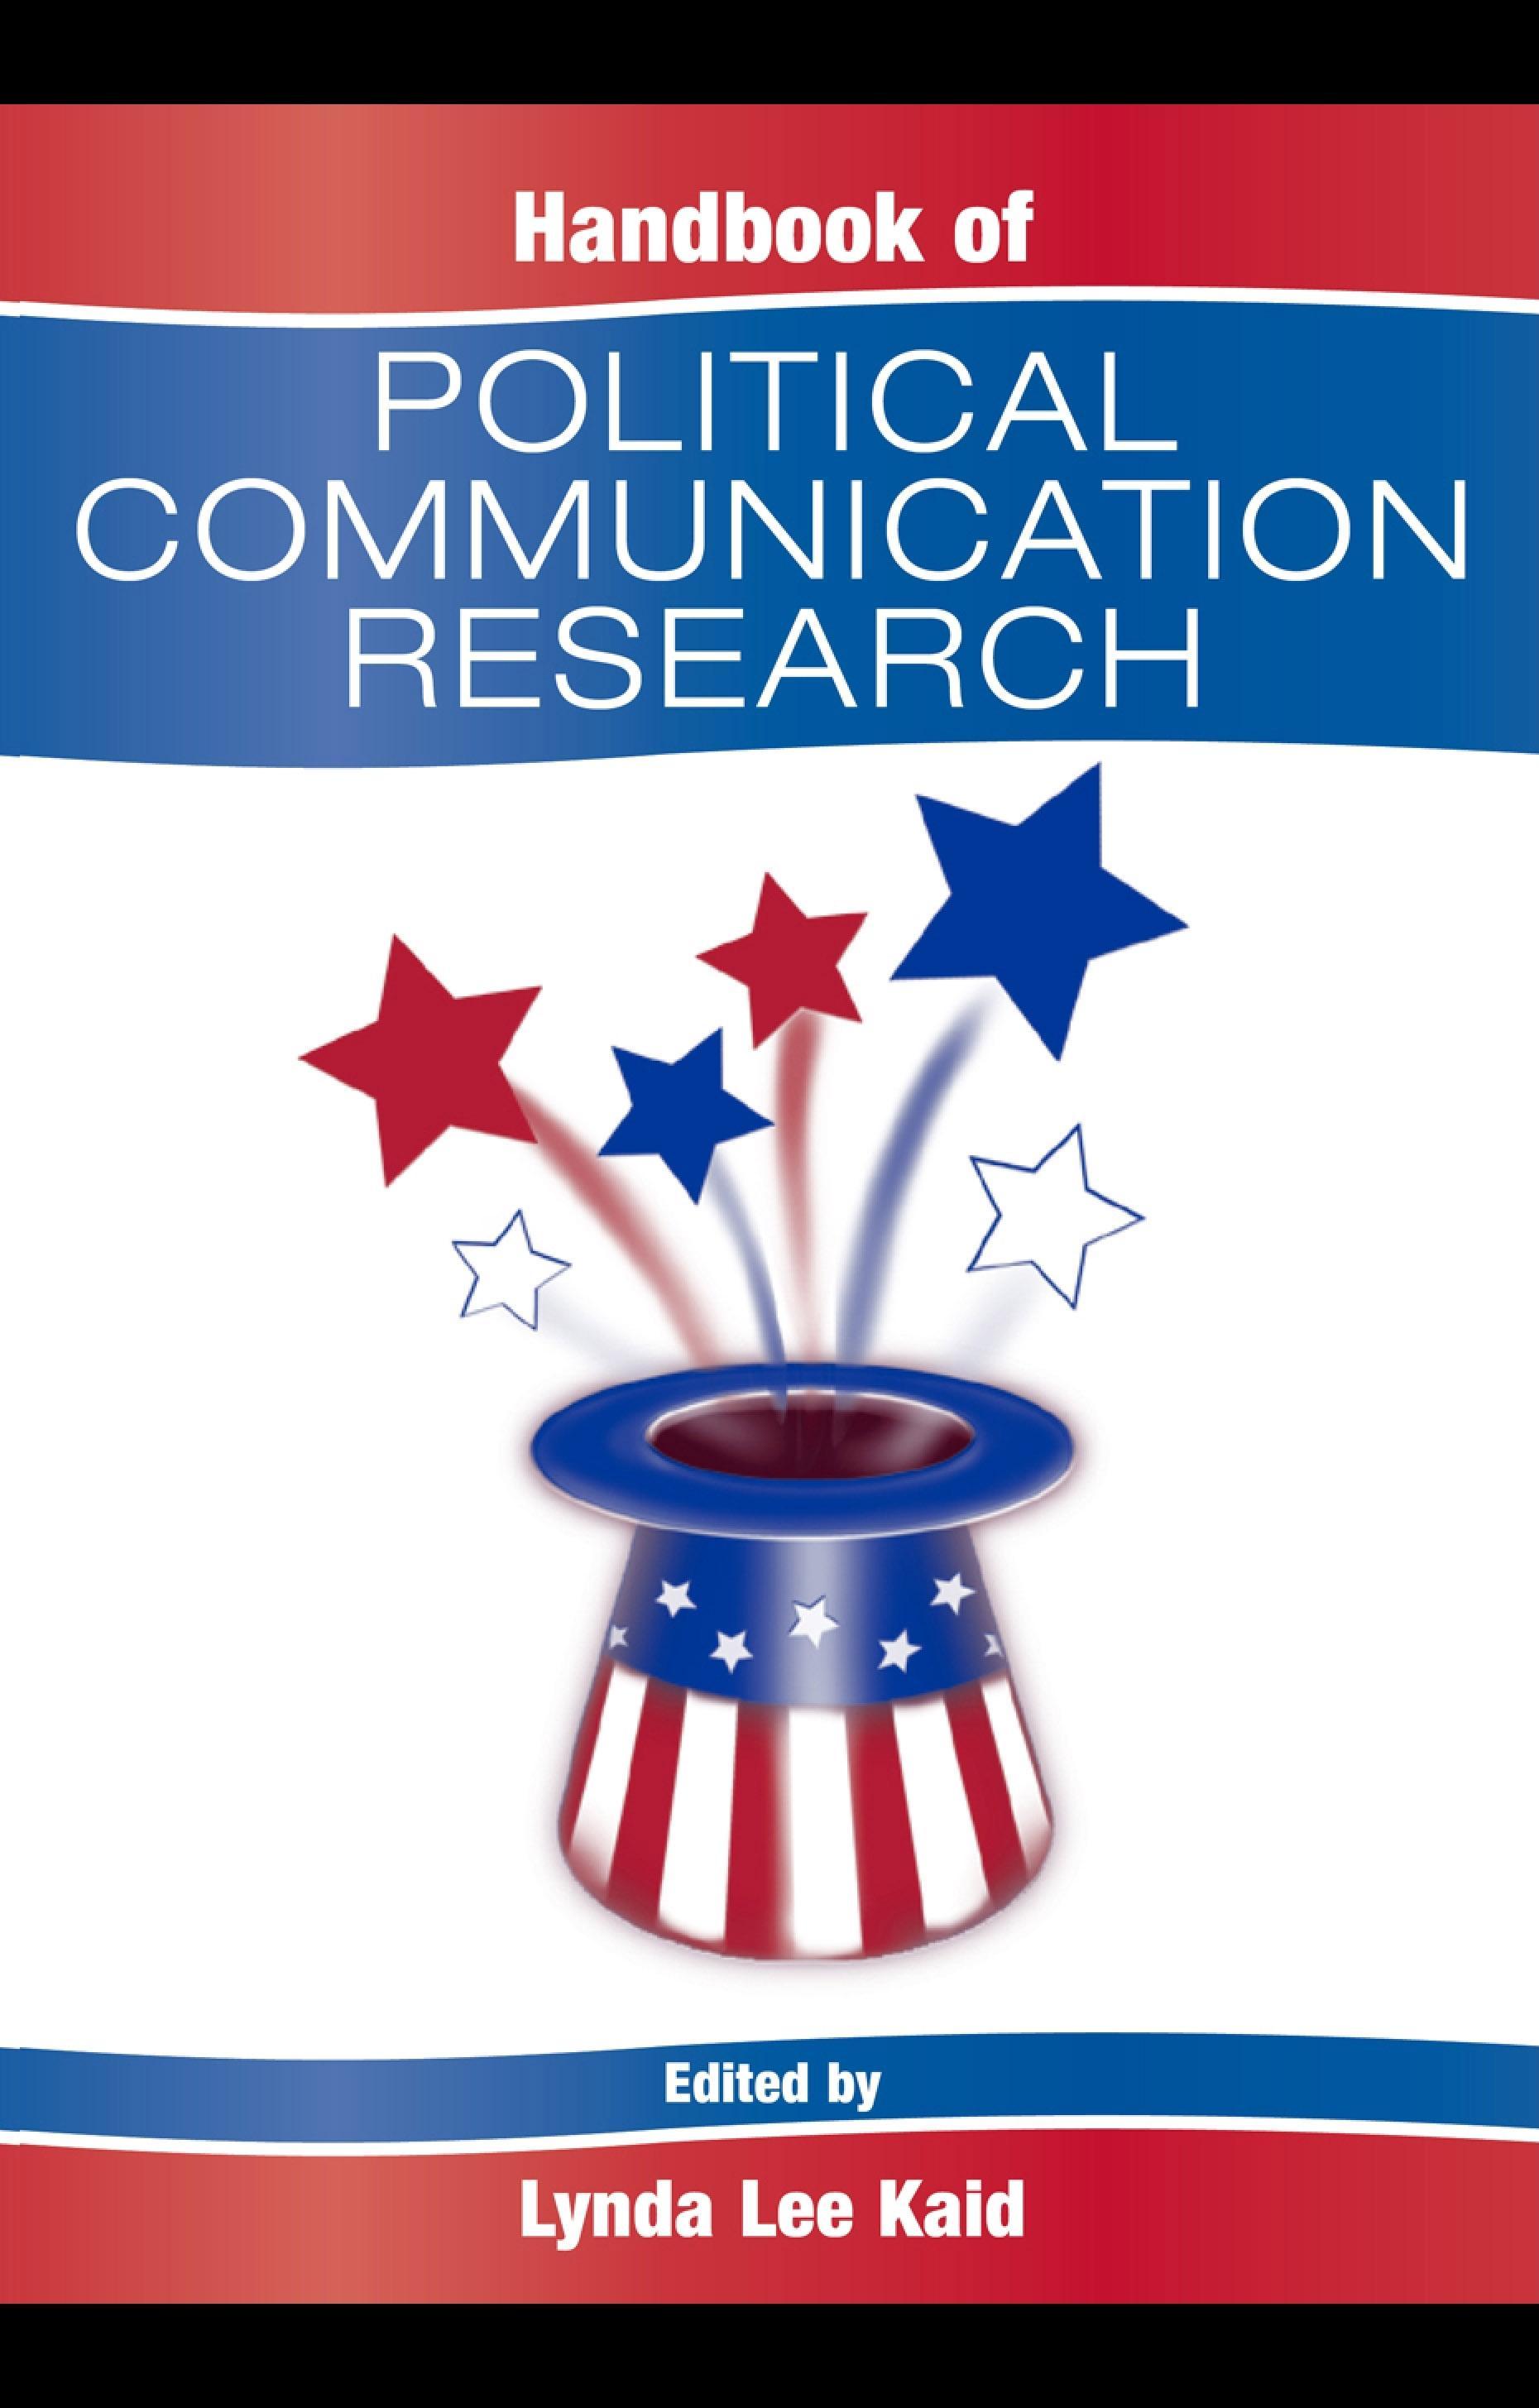 Handbook of Political Communication Research Lynda Lee Kaid